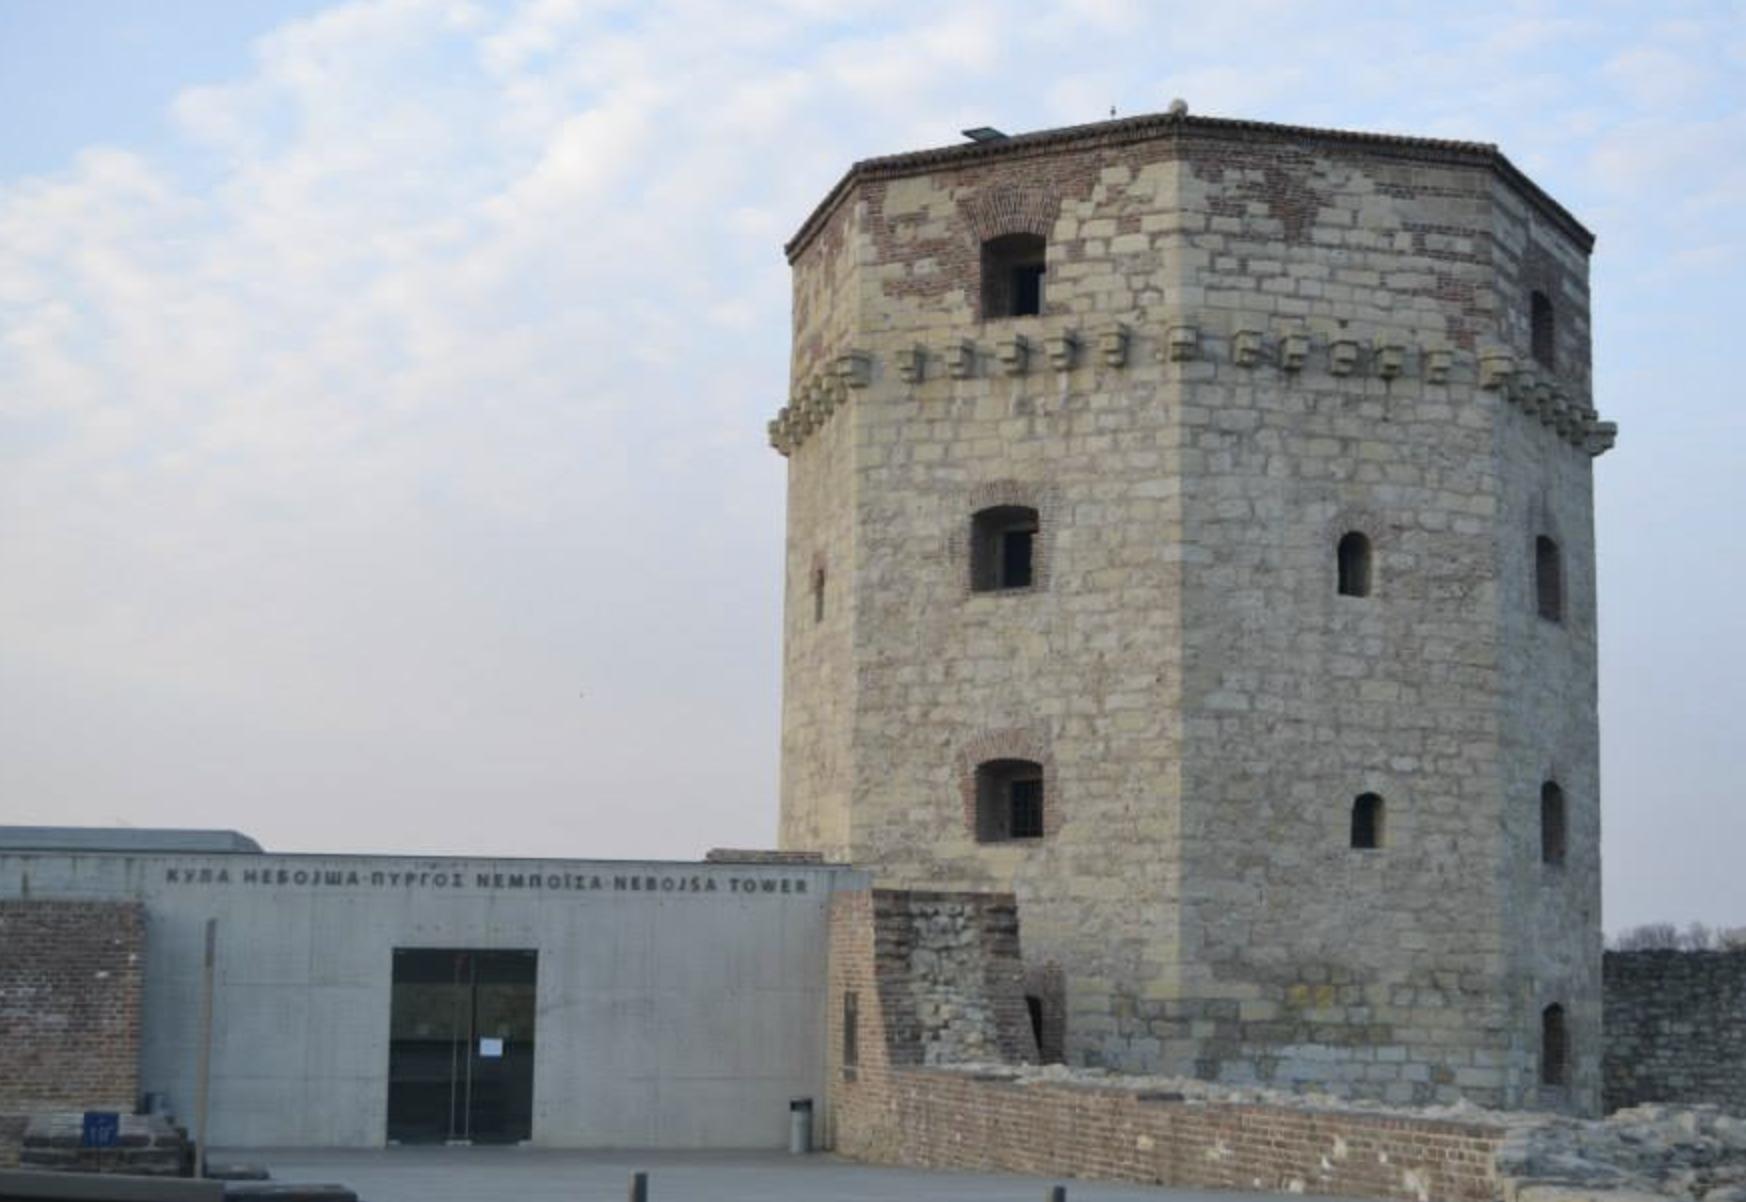 Dunav Fest commemorates the 200th anniversary of the Greek Revolution and Mikis Theodorakis